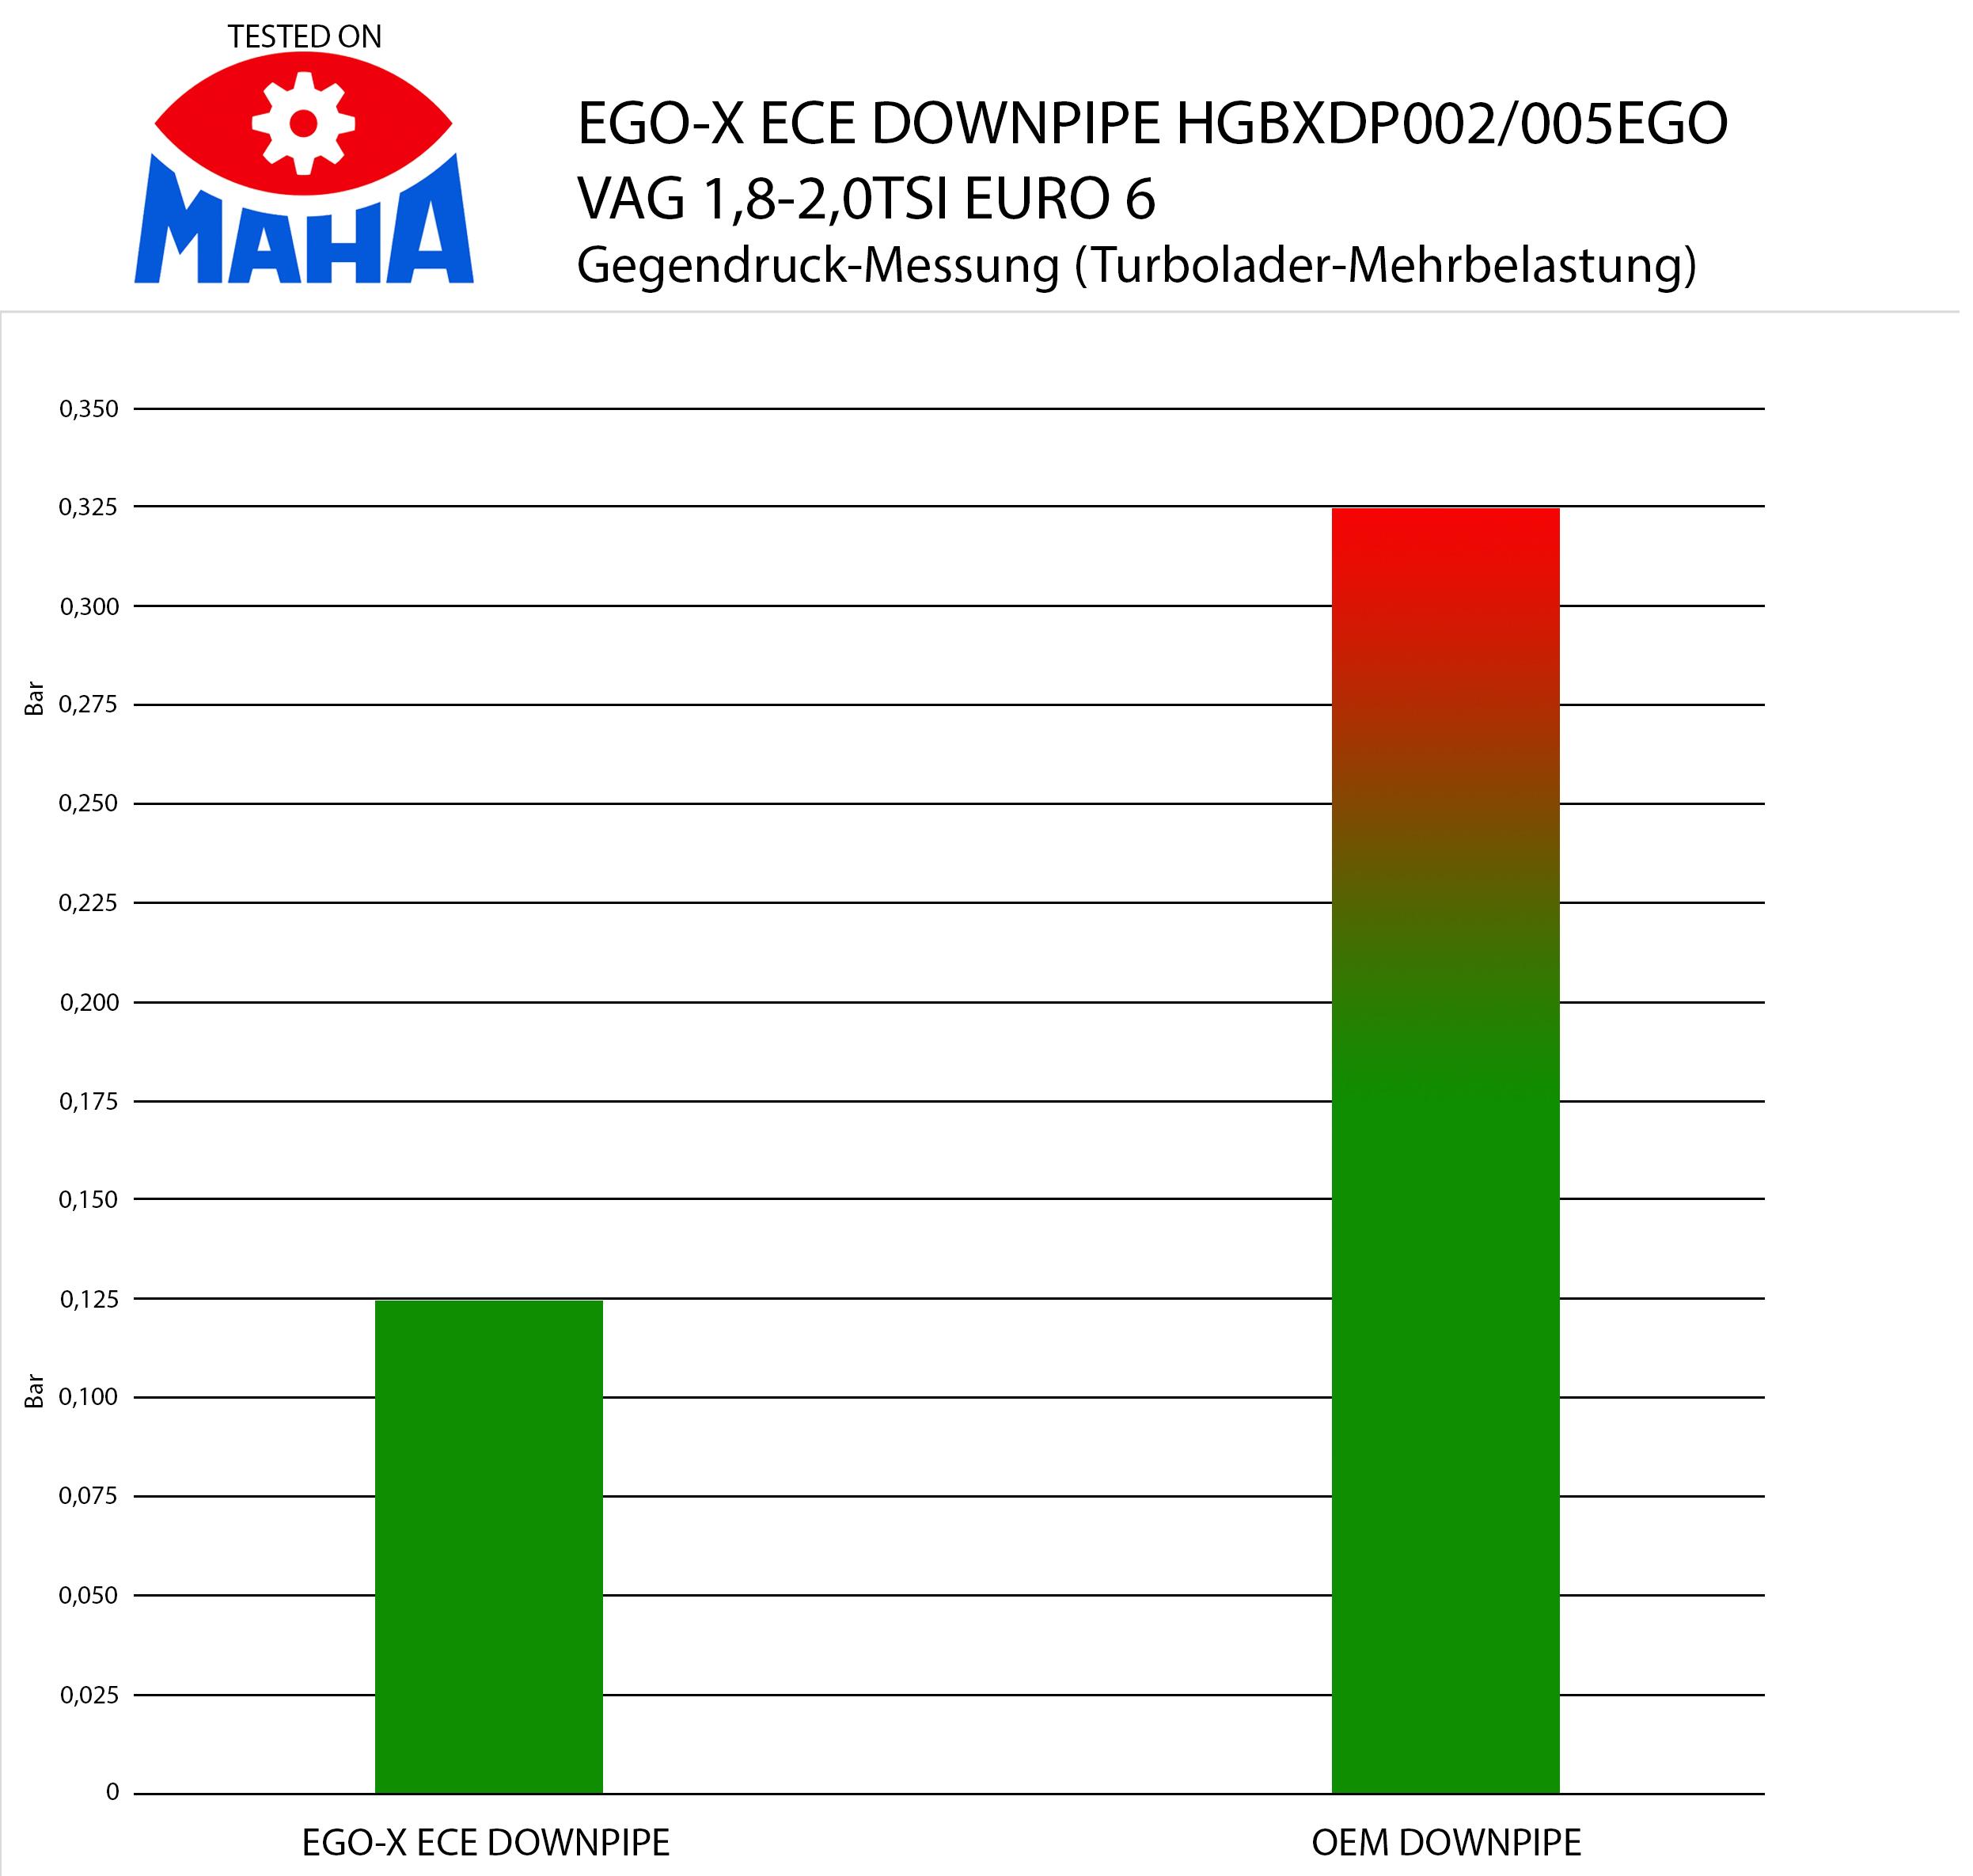 Gegendruck-Messung Bull-X EGO-Downpipe